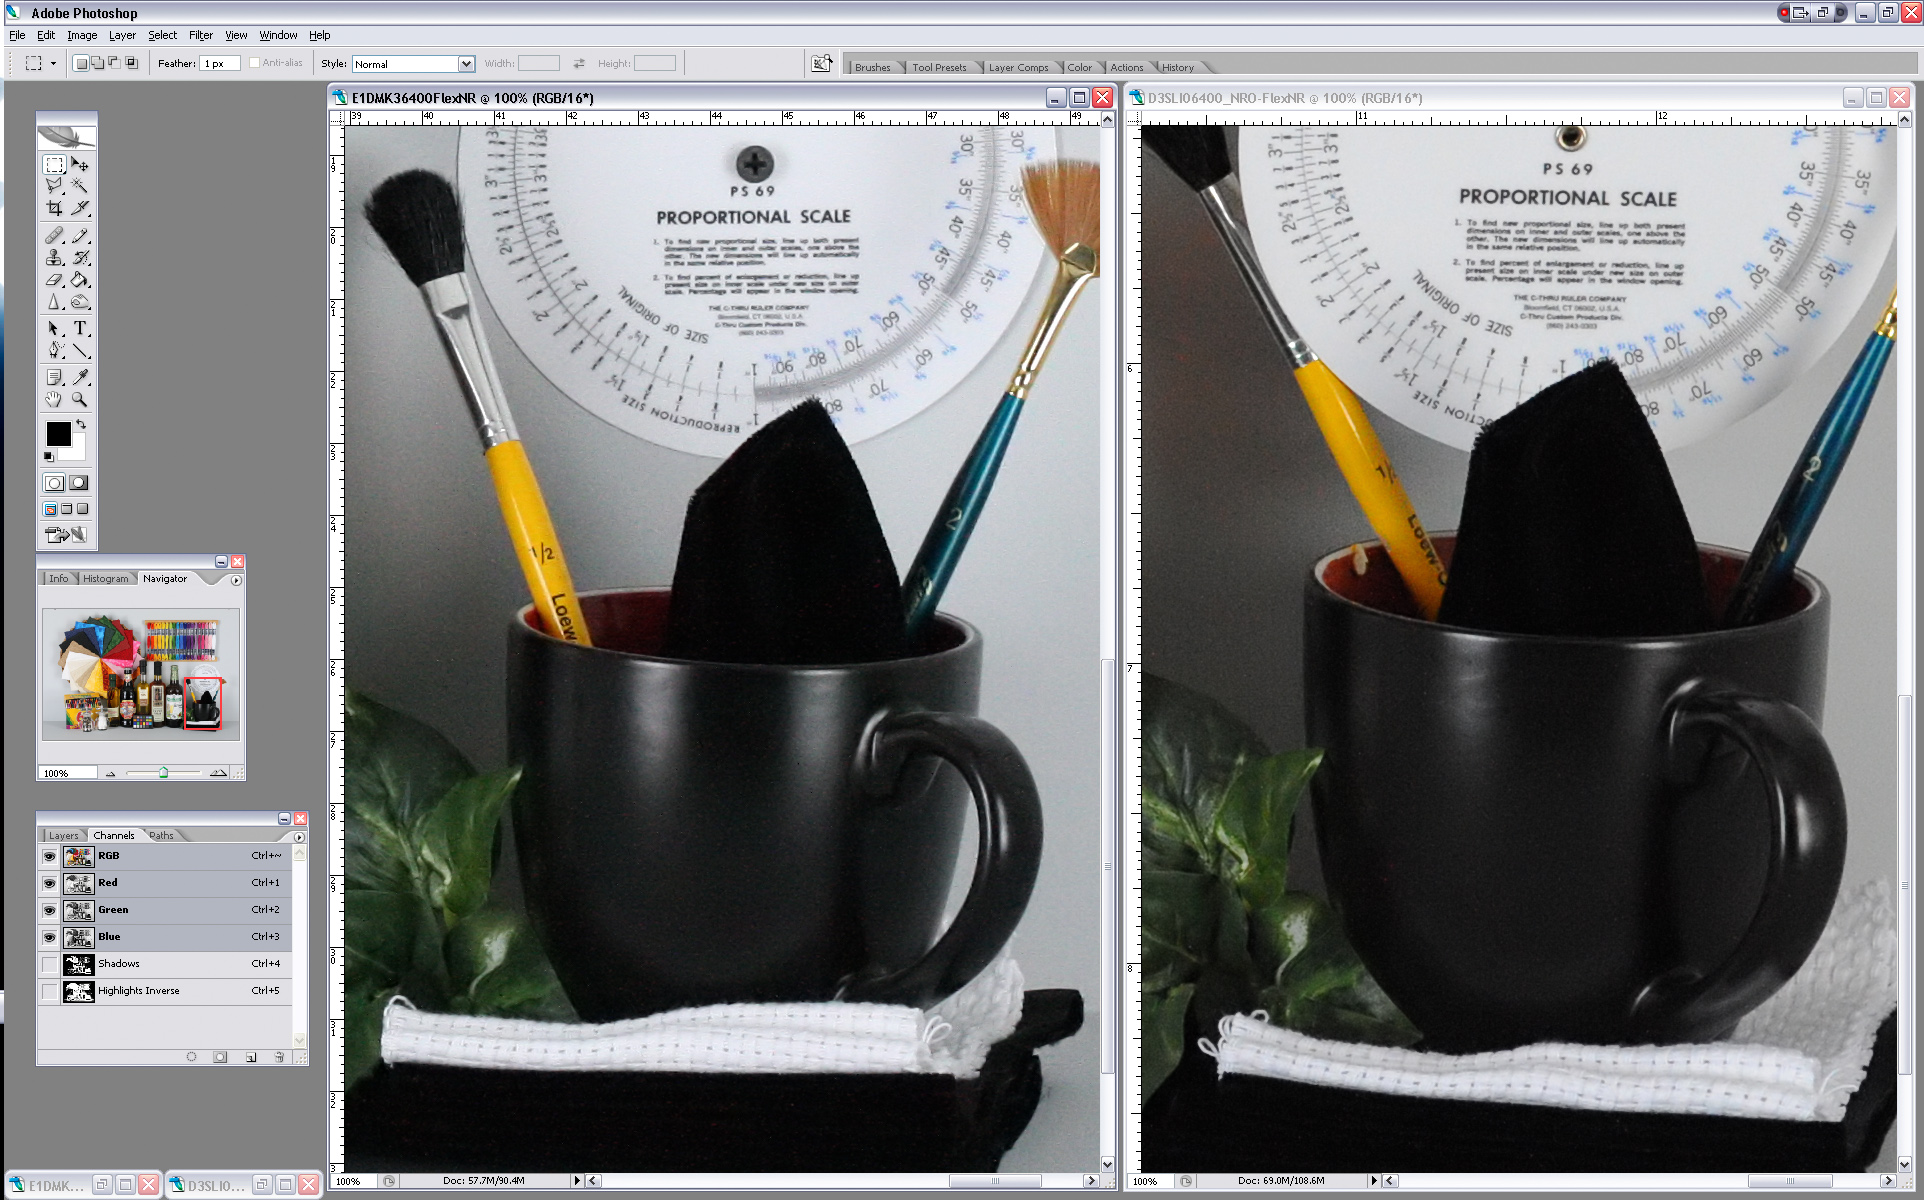 SCREEN_SHOT1D3_vs_D3-FlexNR-3.jpg